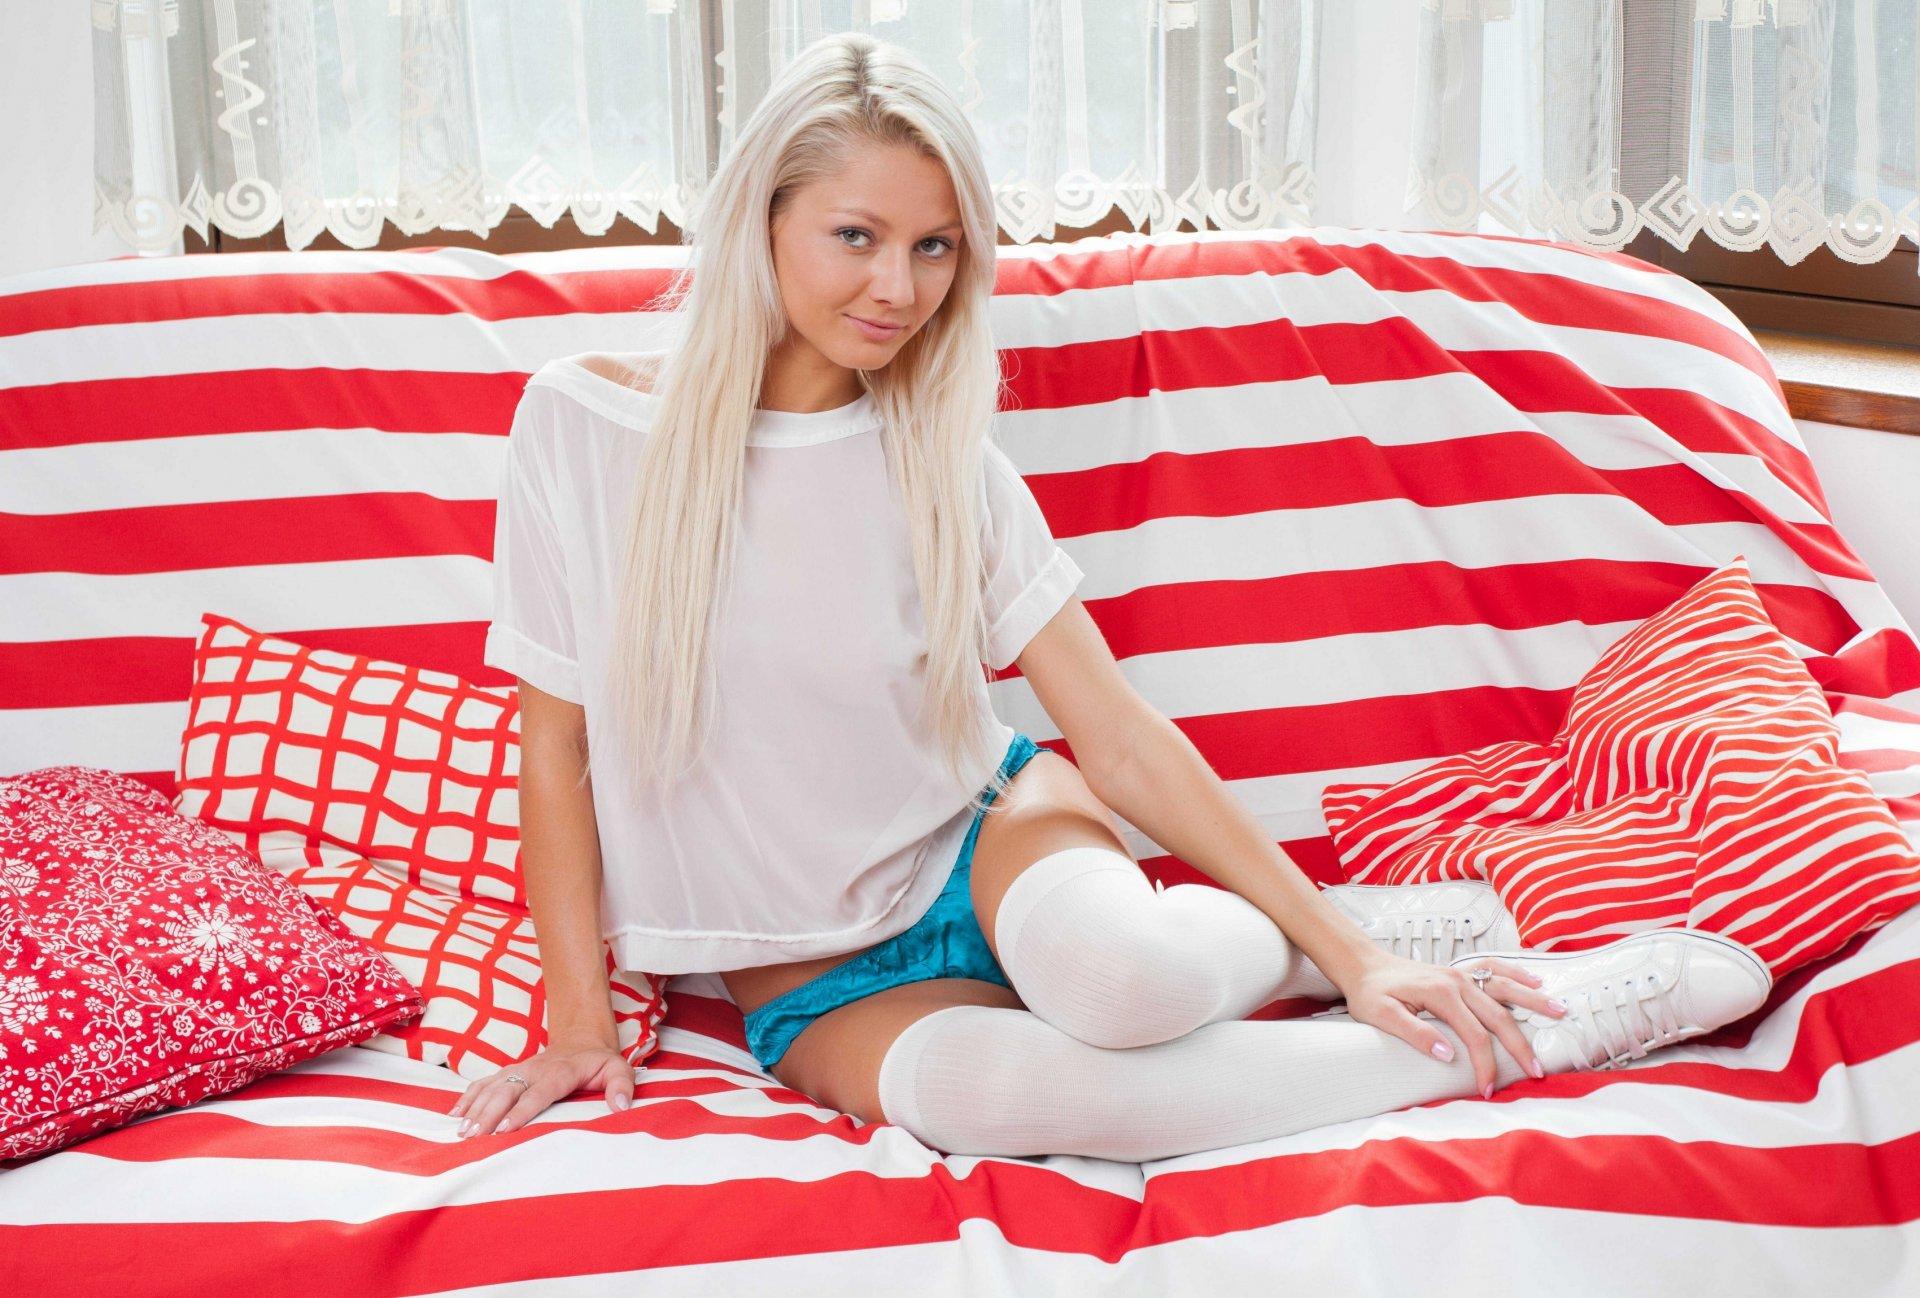 russkoe-porno-s-molodenkoy-blondinkoy